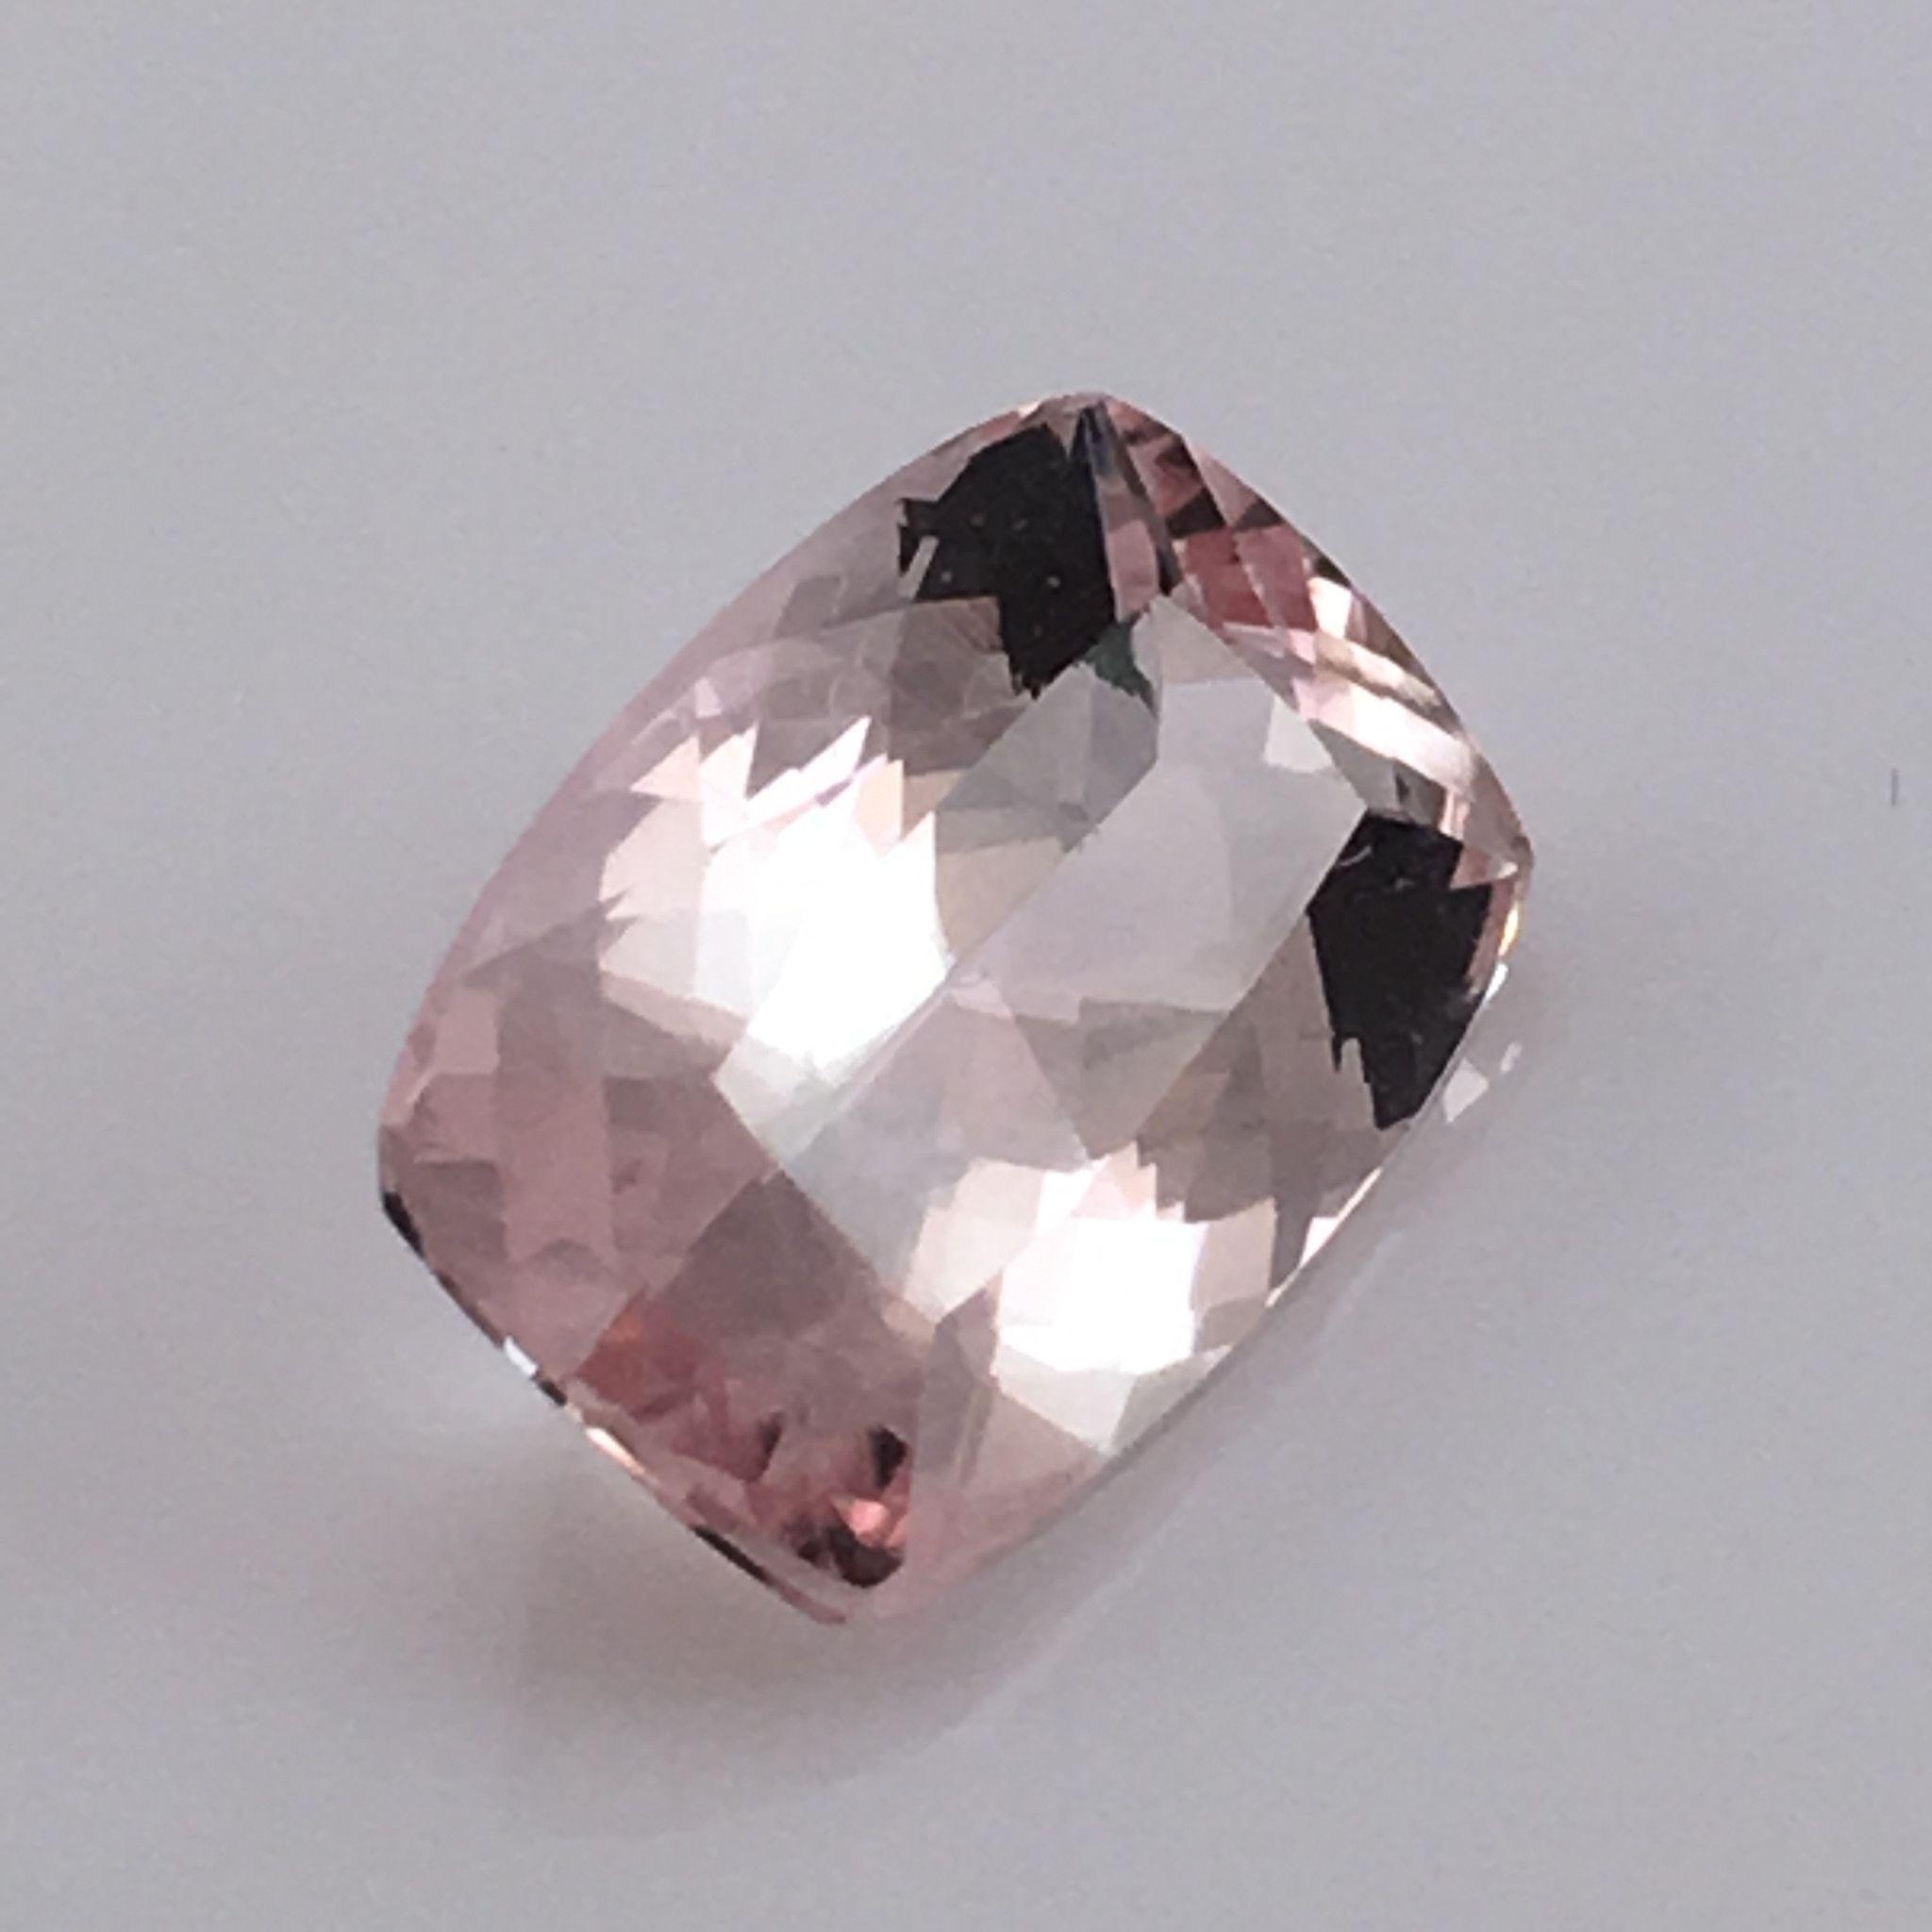 7 2 Carat Brazilian Morganite Gemstone Artesanato Com Pedras